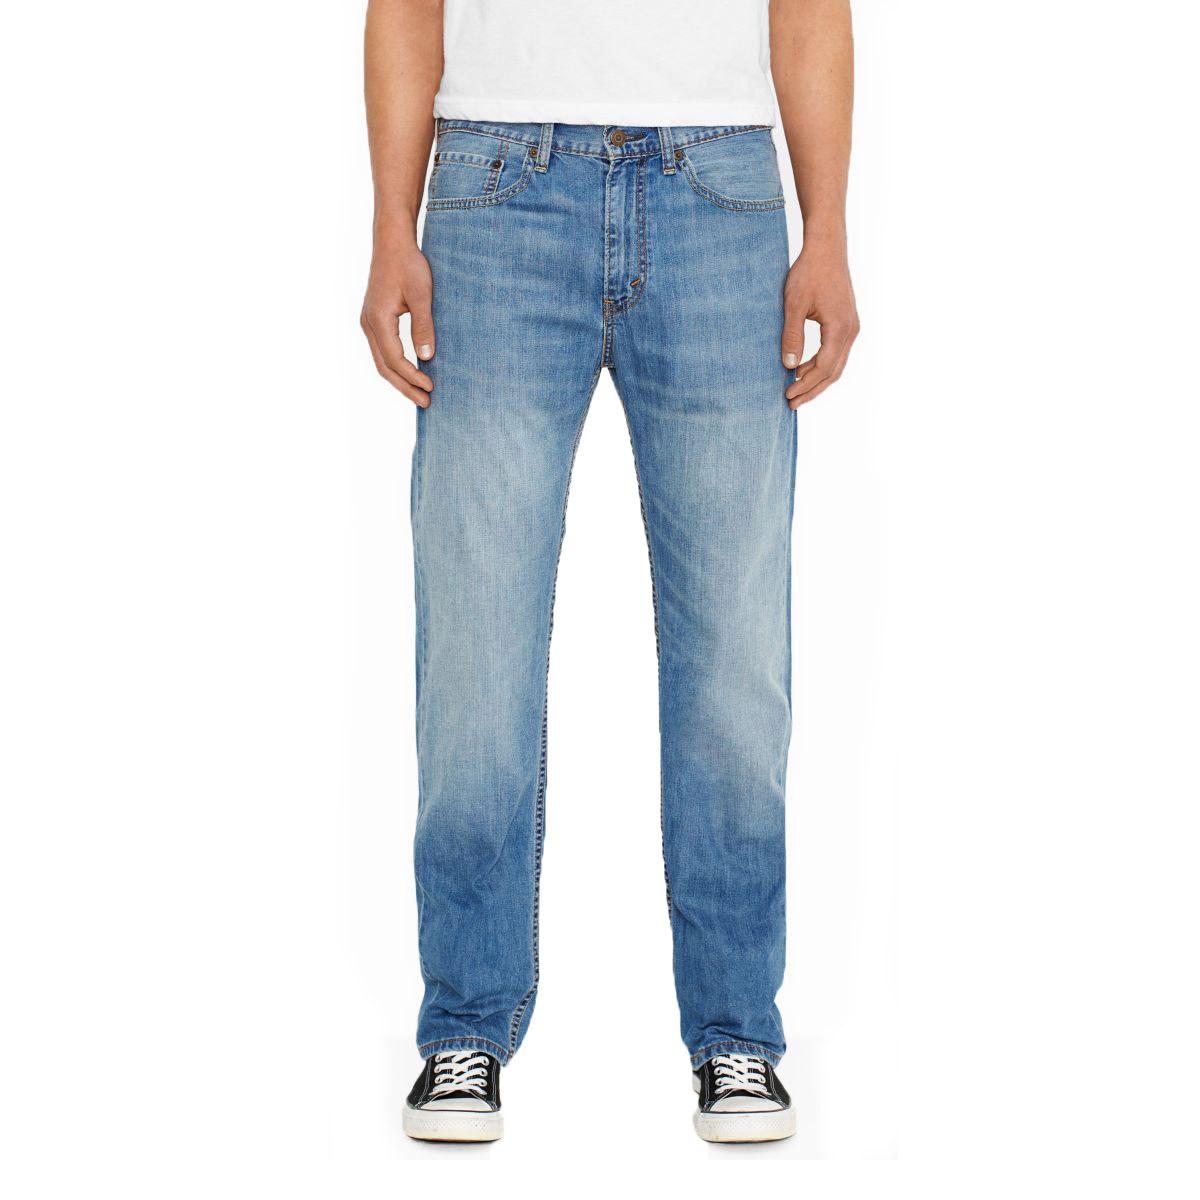 Levi's Men's 505 Regular Fit Jeans - Blue, 32/36